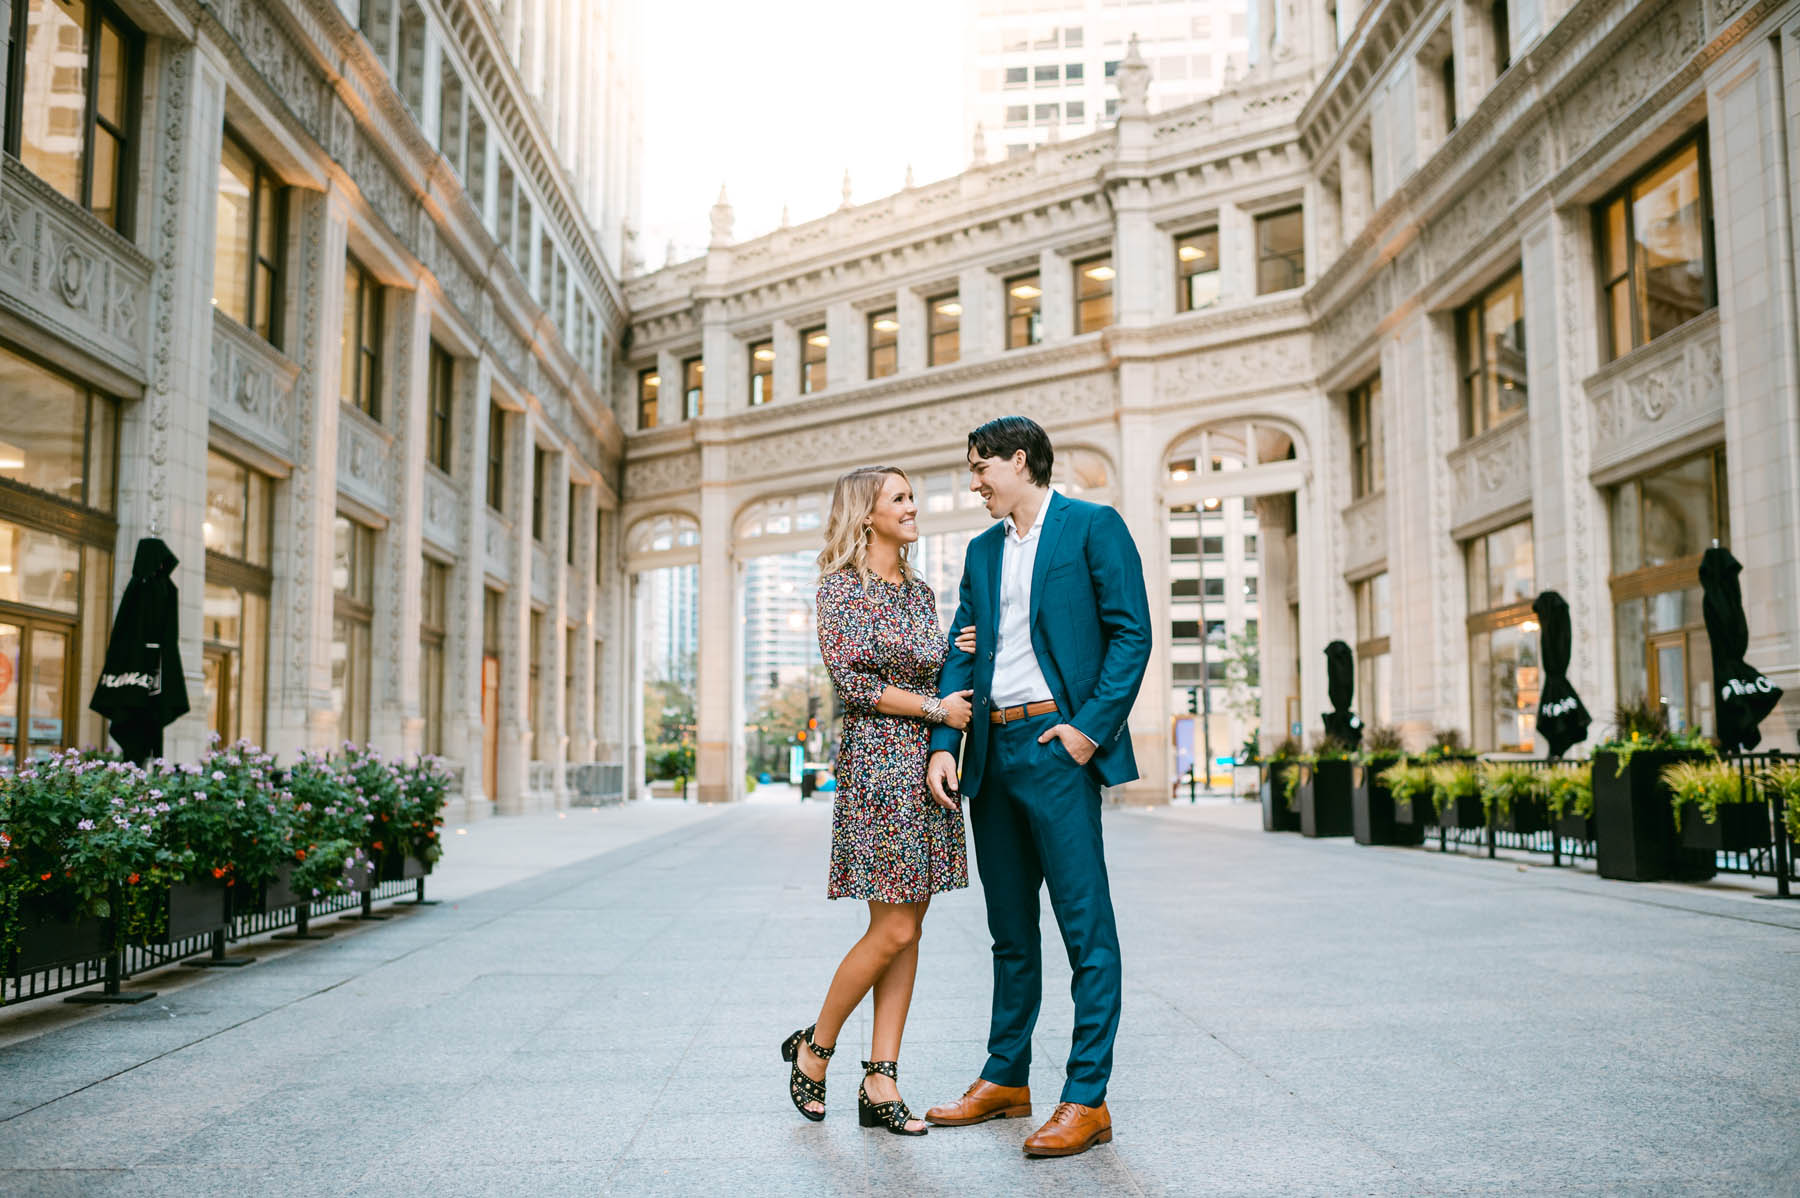 Wrigley Building Engagement Photo